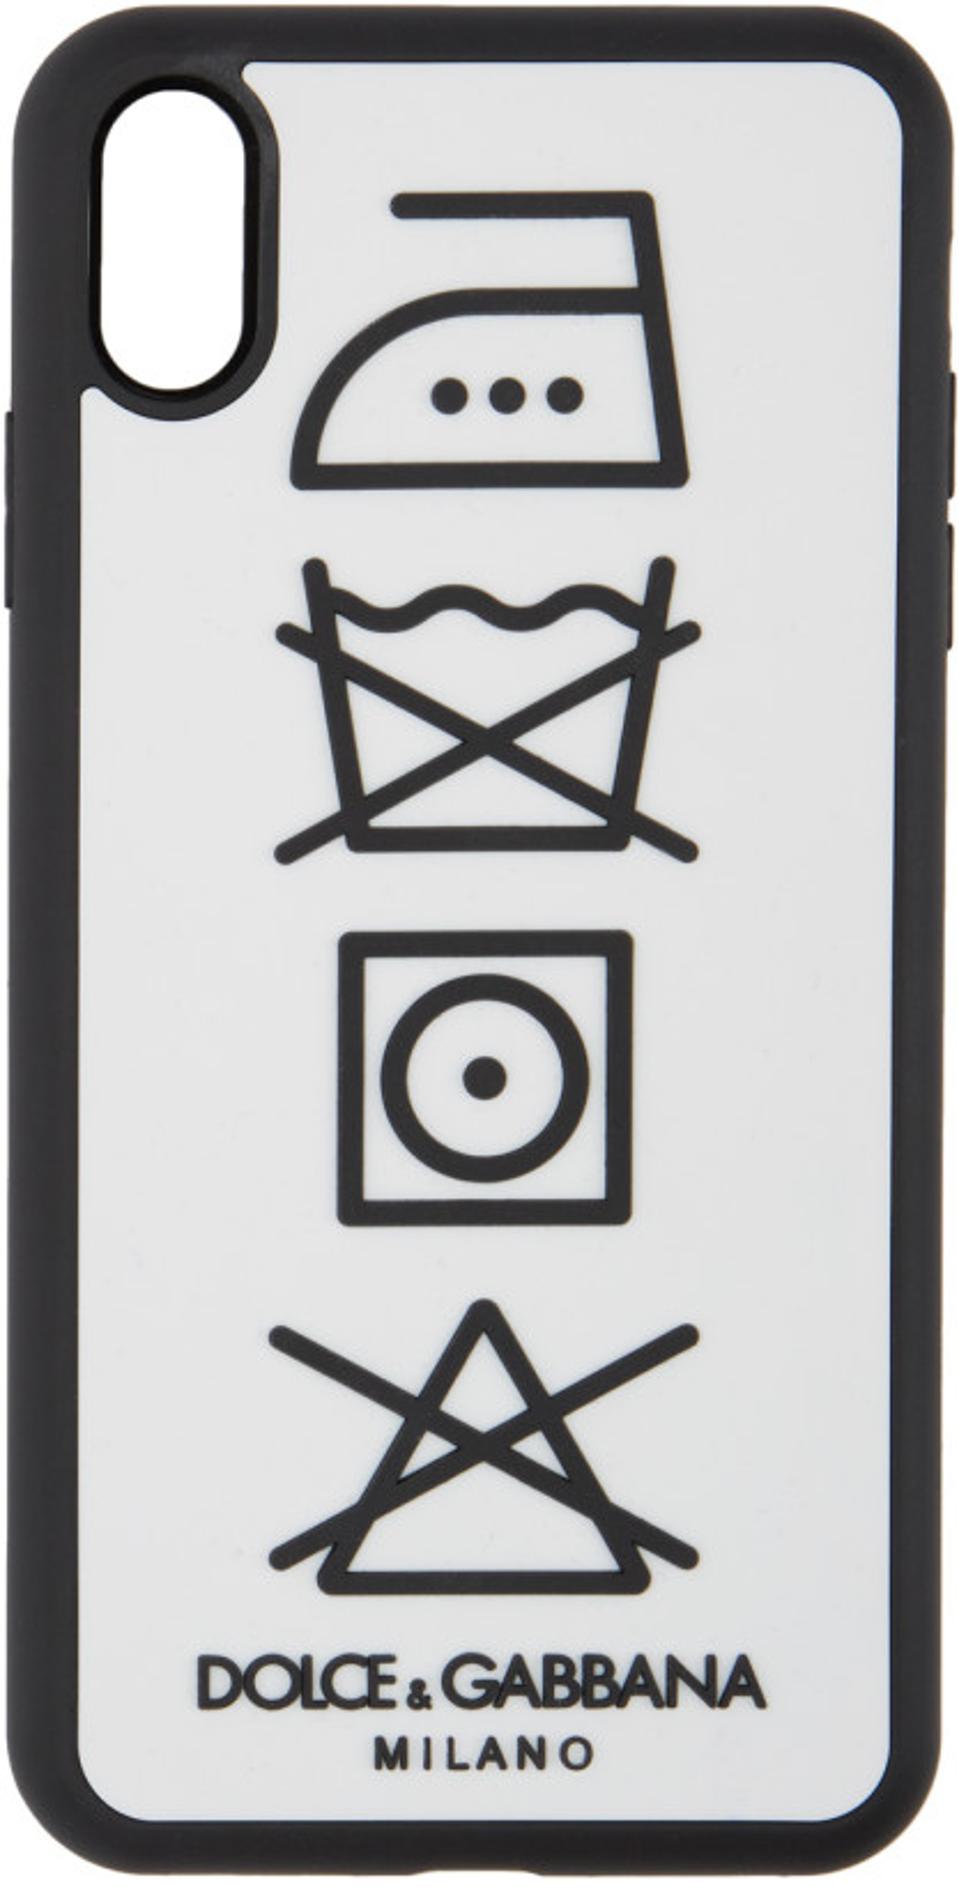 Dolce & Gabbana White Laundry iPhone XS Max Case